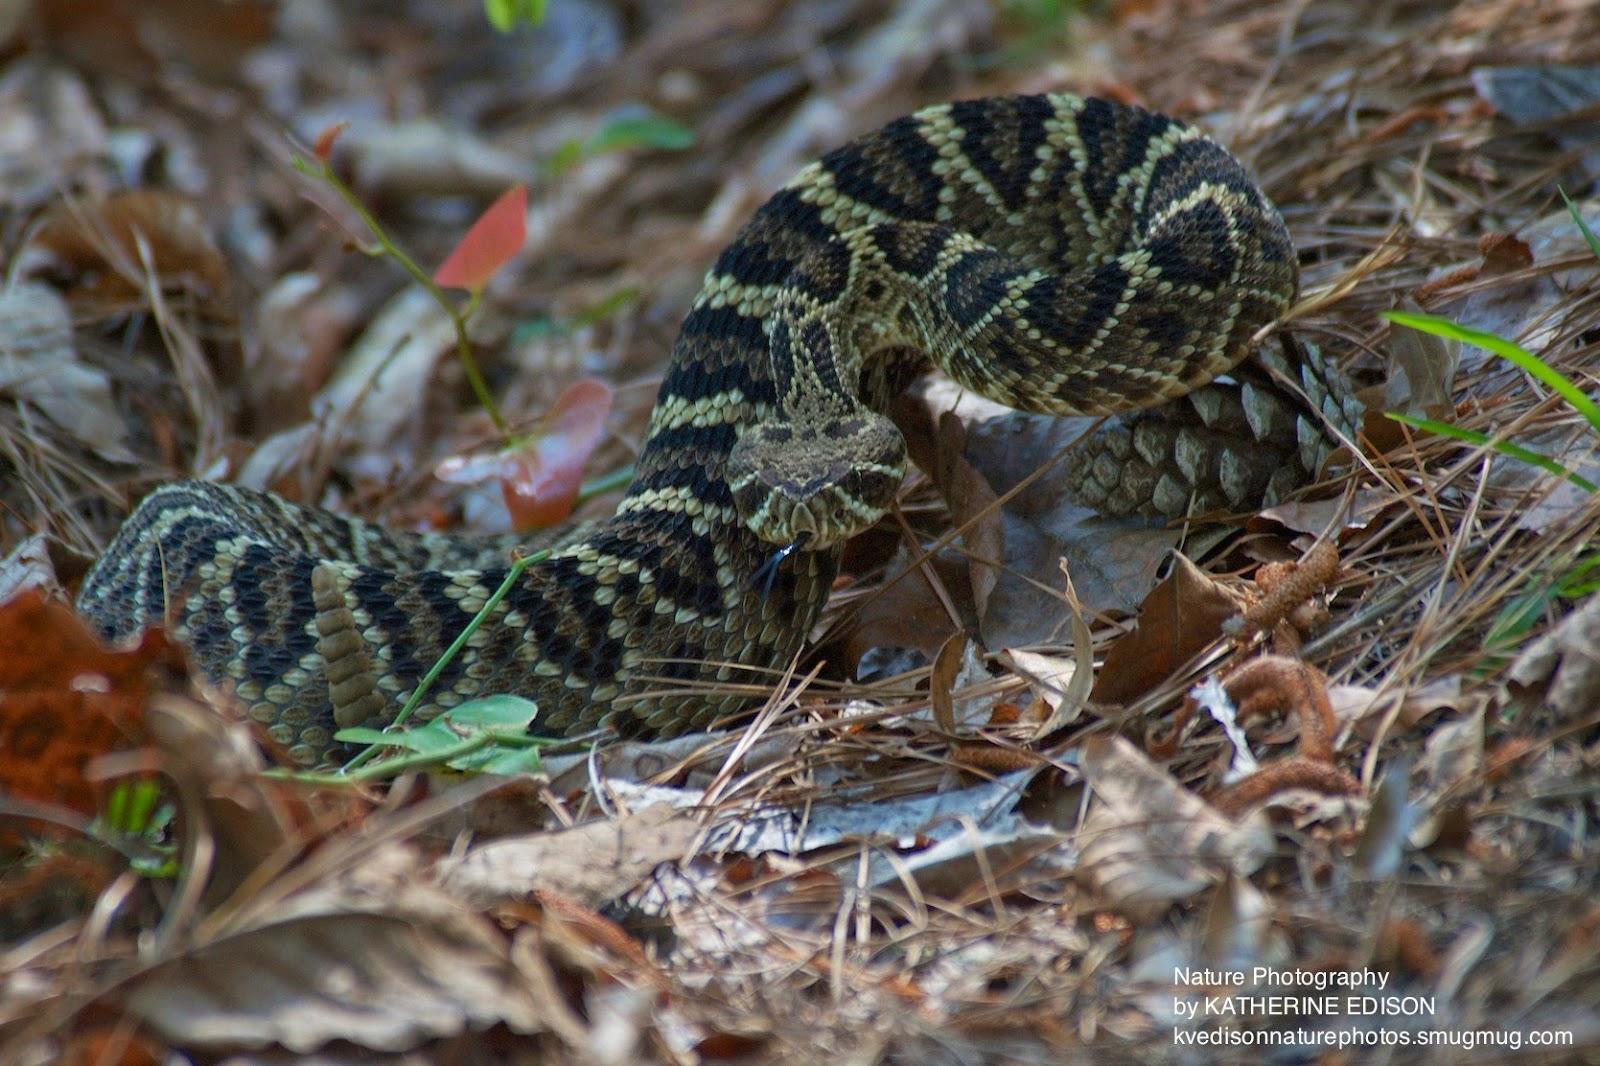 Baby diamondback rattlesnake